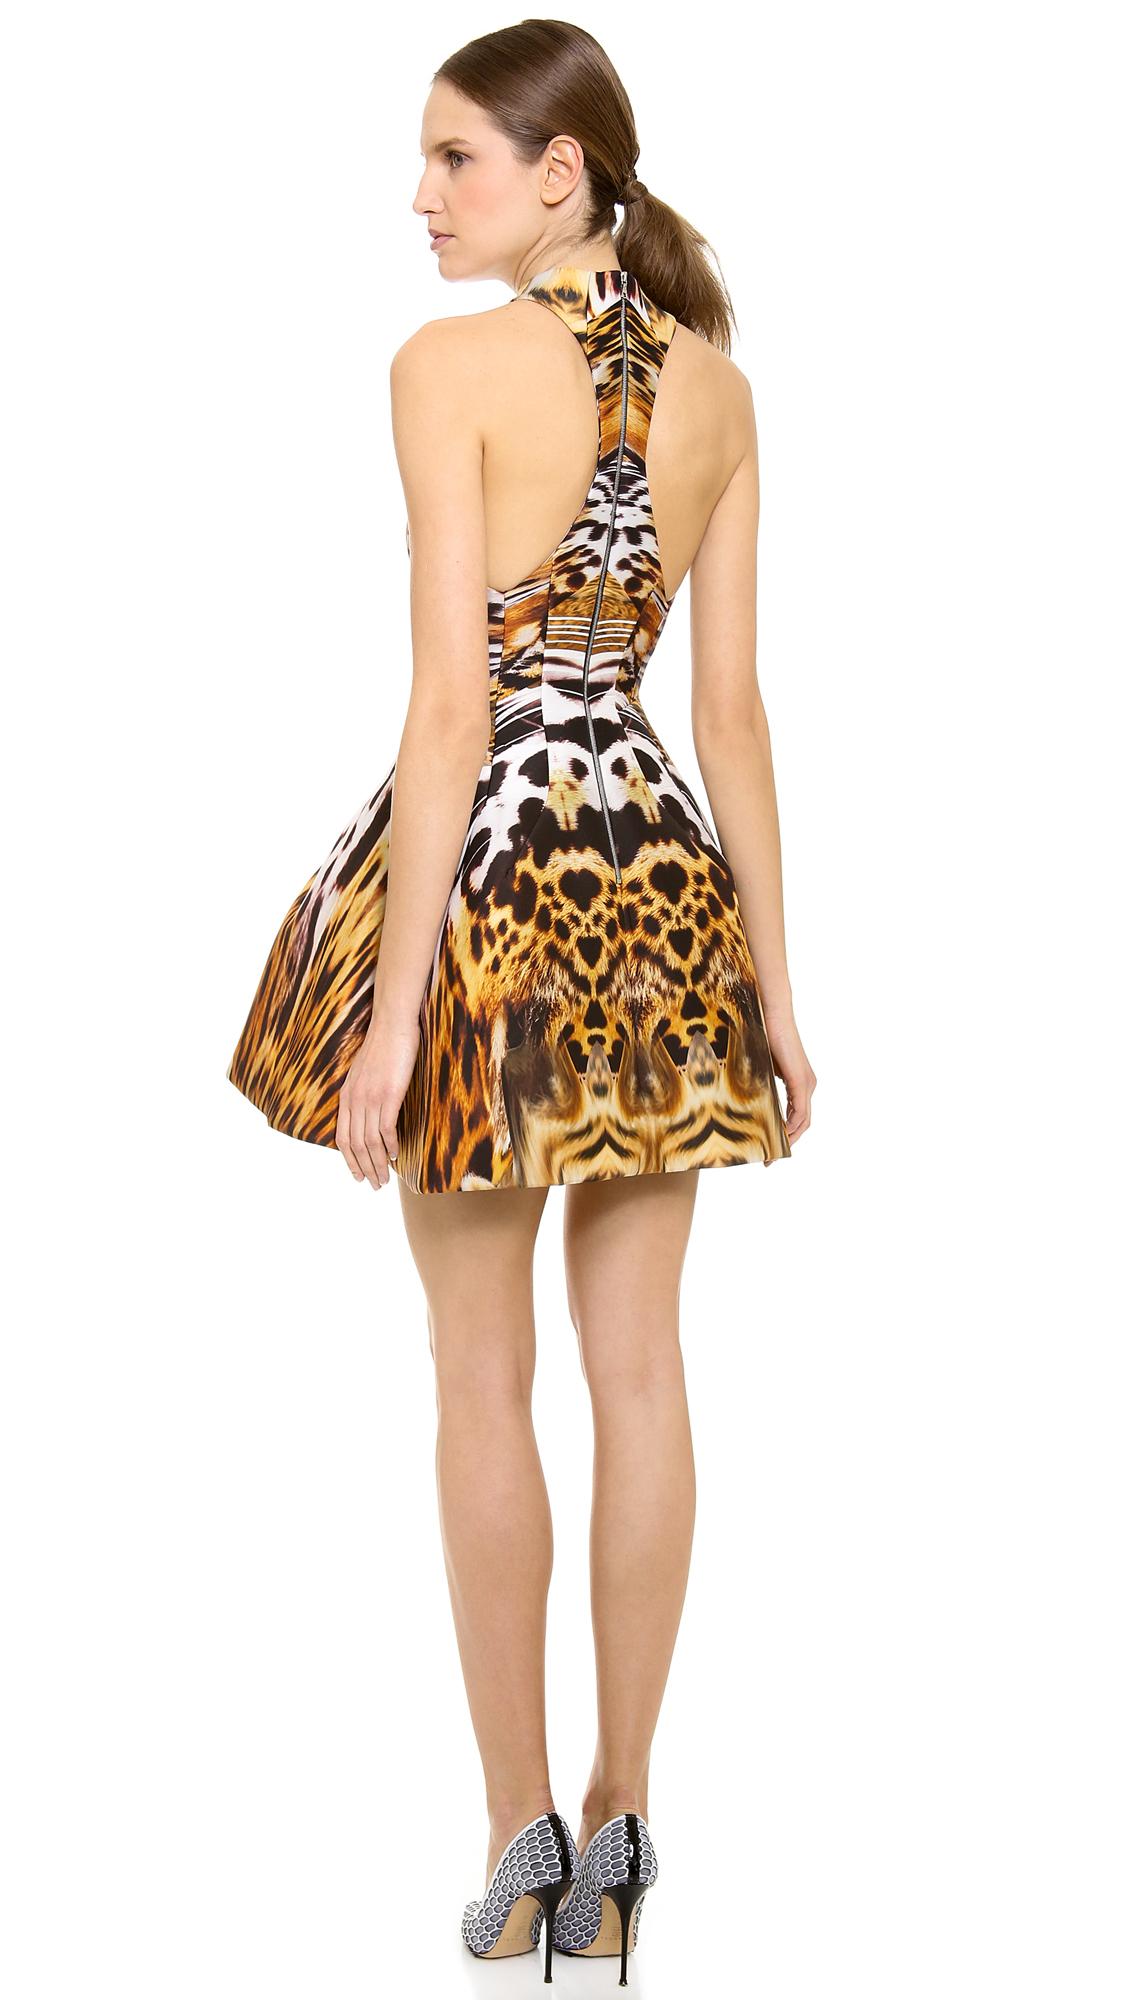 DRESSES - 3/4 length dresses Josh Goot Buy Online Authentic Clearance Nicekicks Cheap Discount Authentic mzacIvBIm